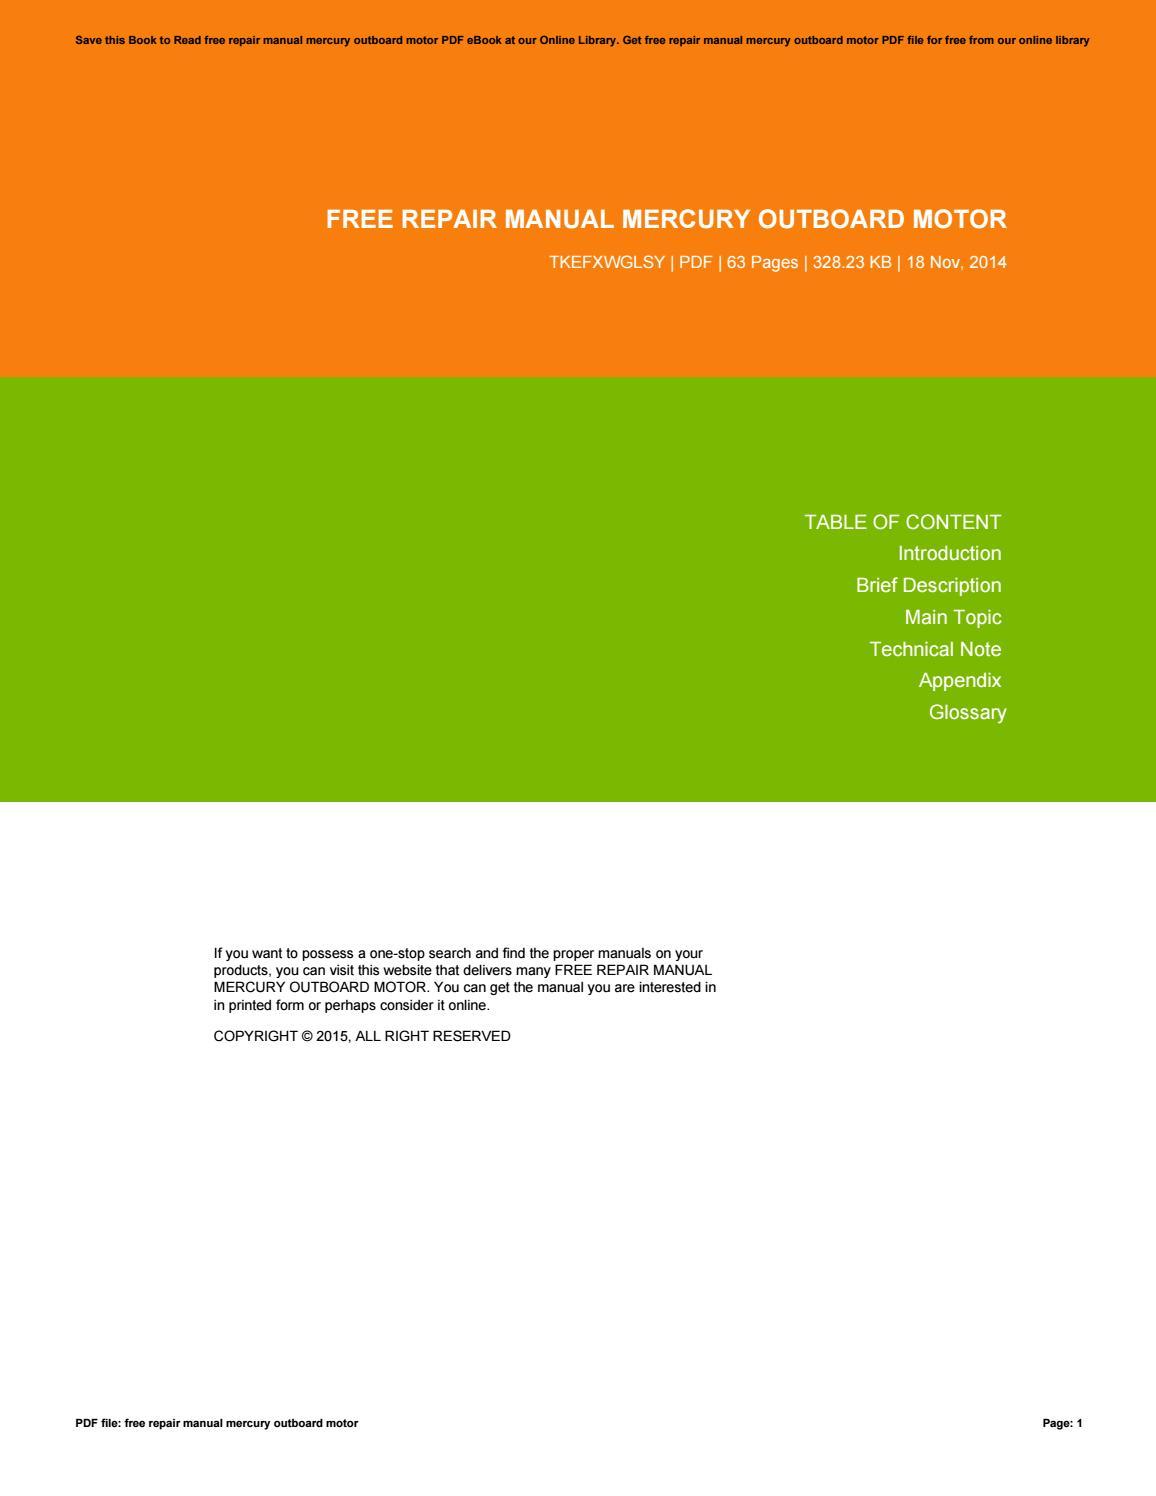 Suzuki Dt 70 Manual Ebook Download Read Arduino For Dummies Free Pdf Ebook969w Array Df25 2015 Rh Bitlab Solutions